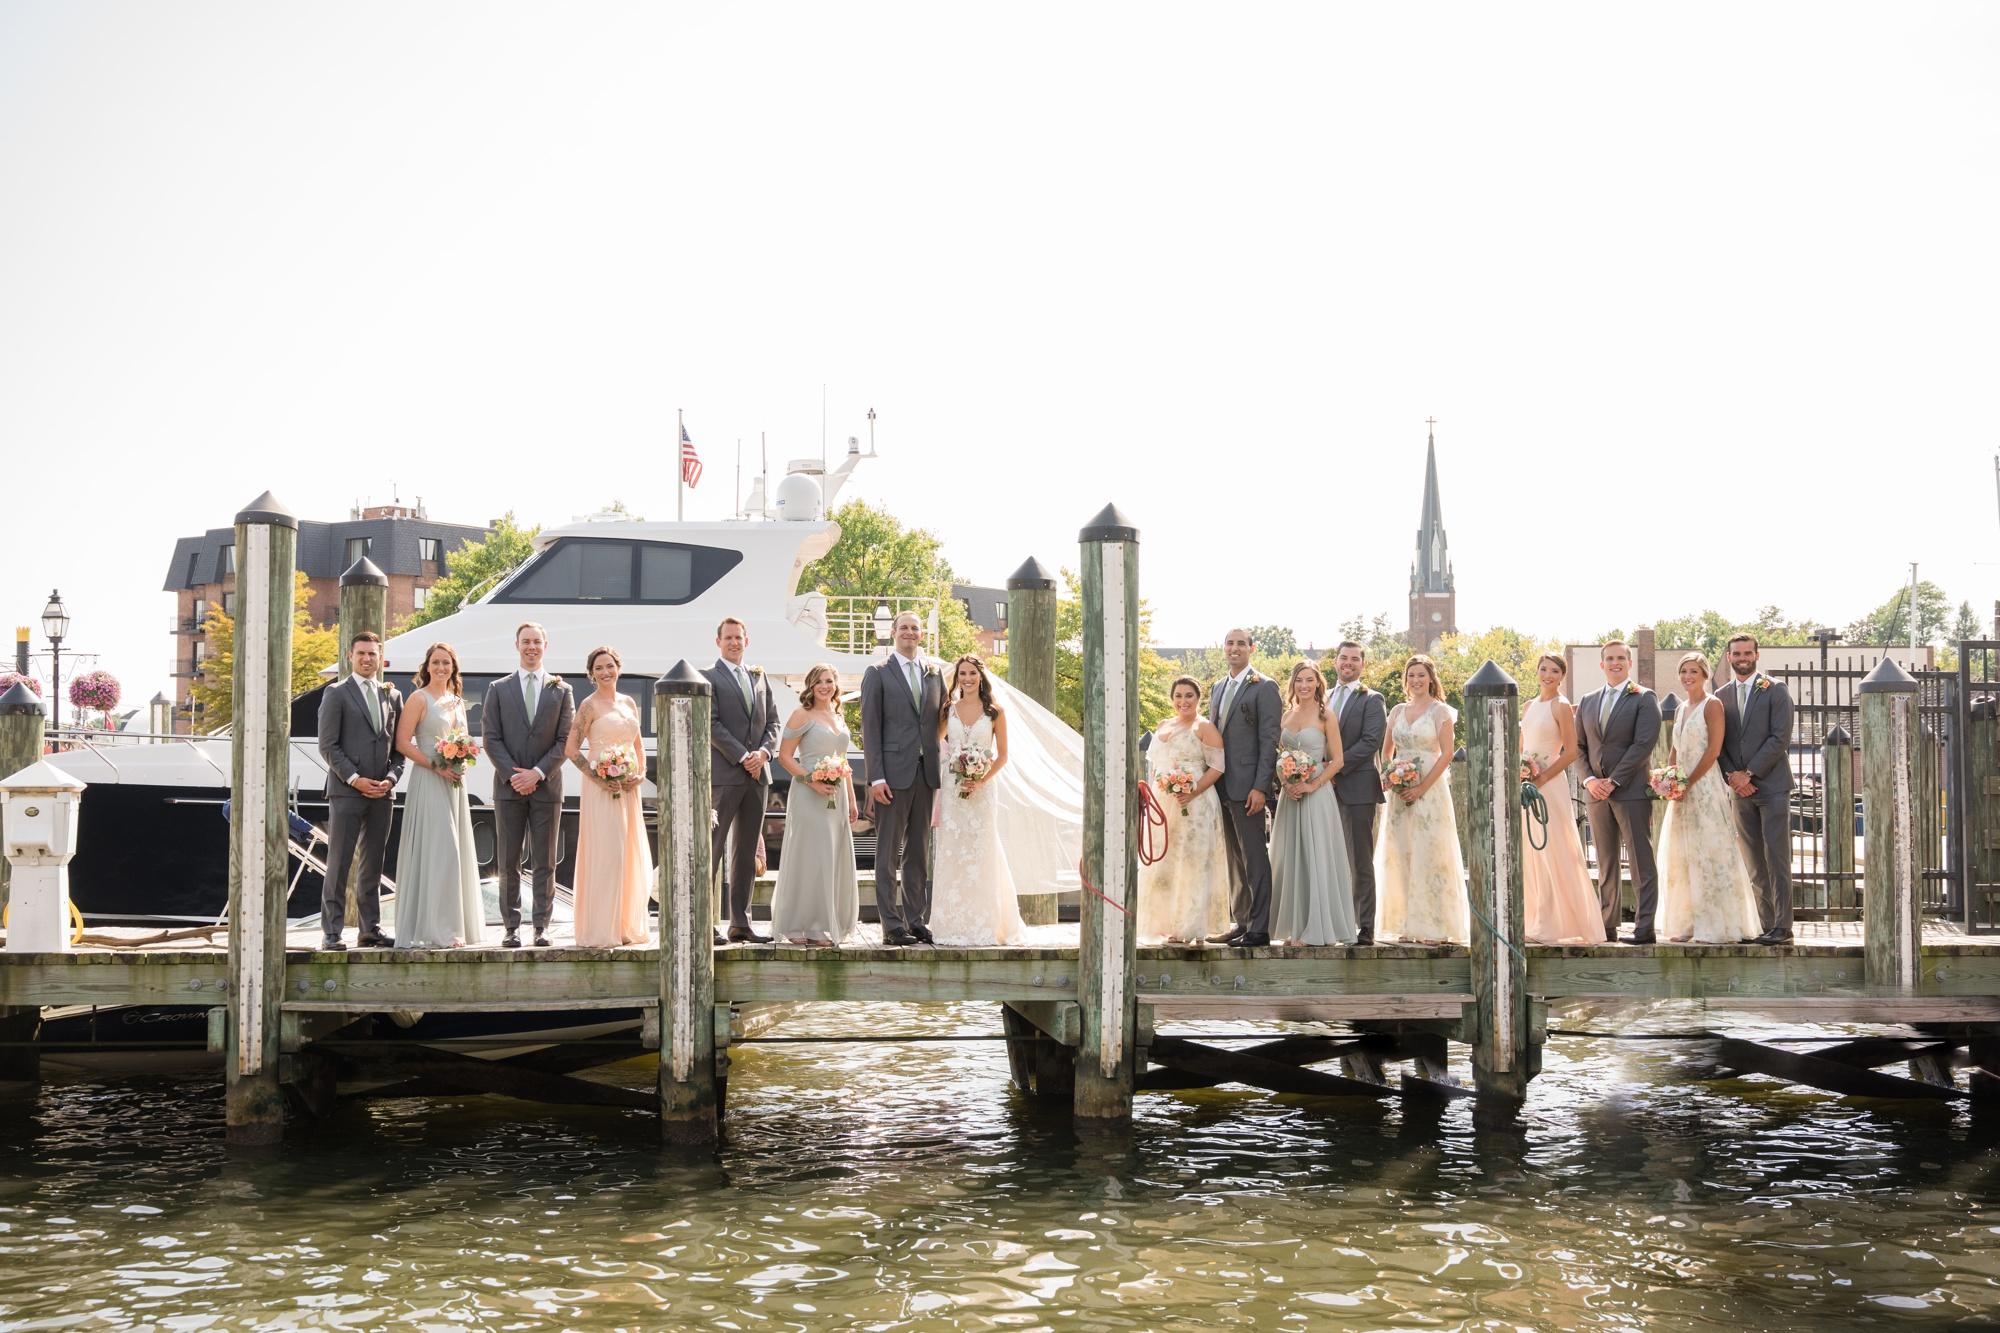 Downtown City Dock Annapolis wedding party photos